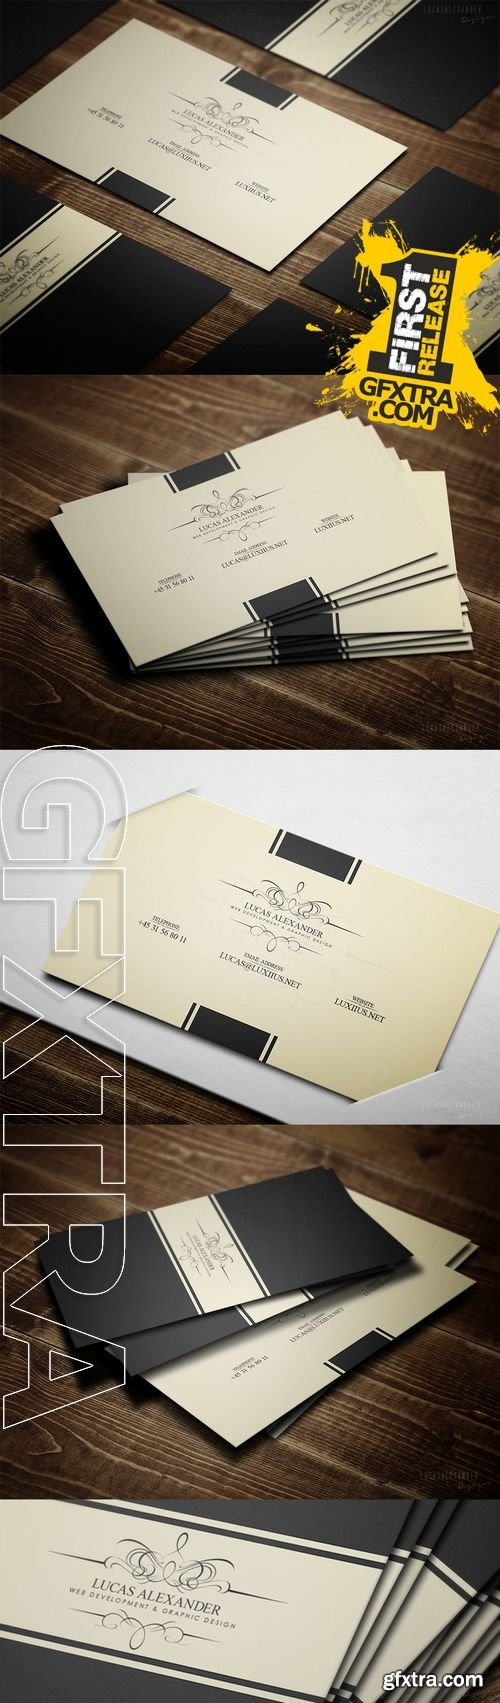 Classy Business Card - CM 20194